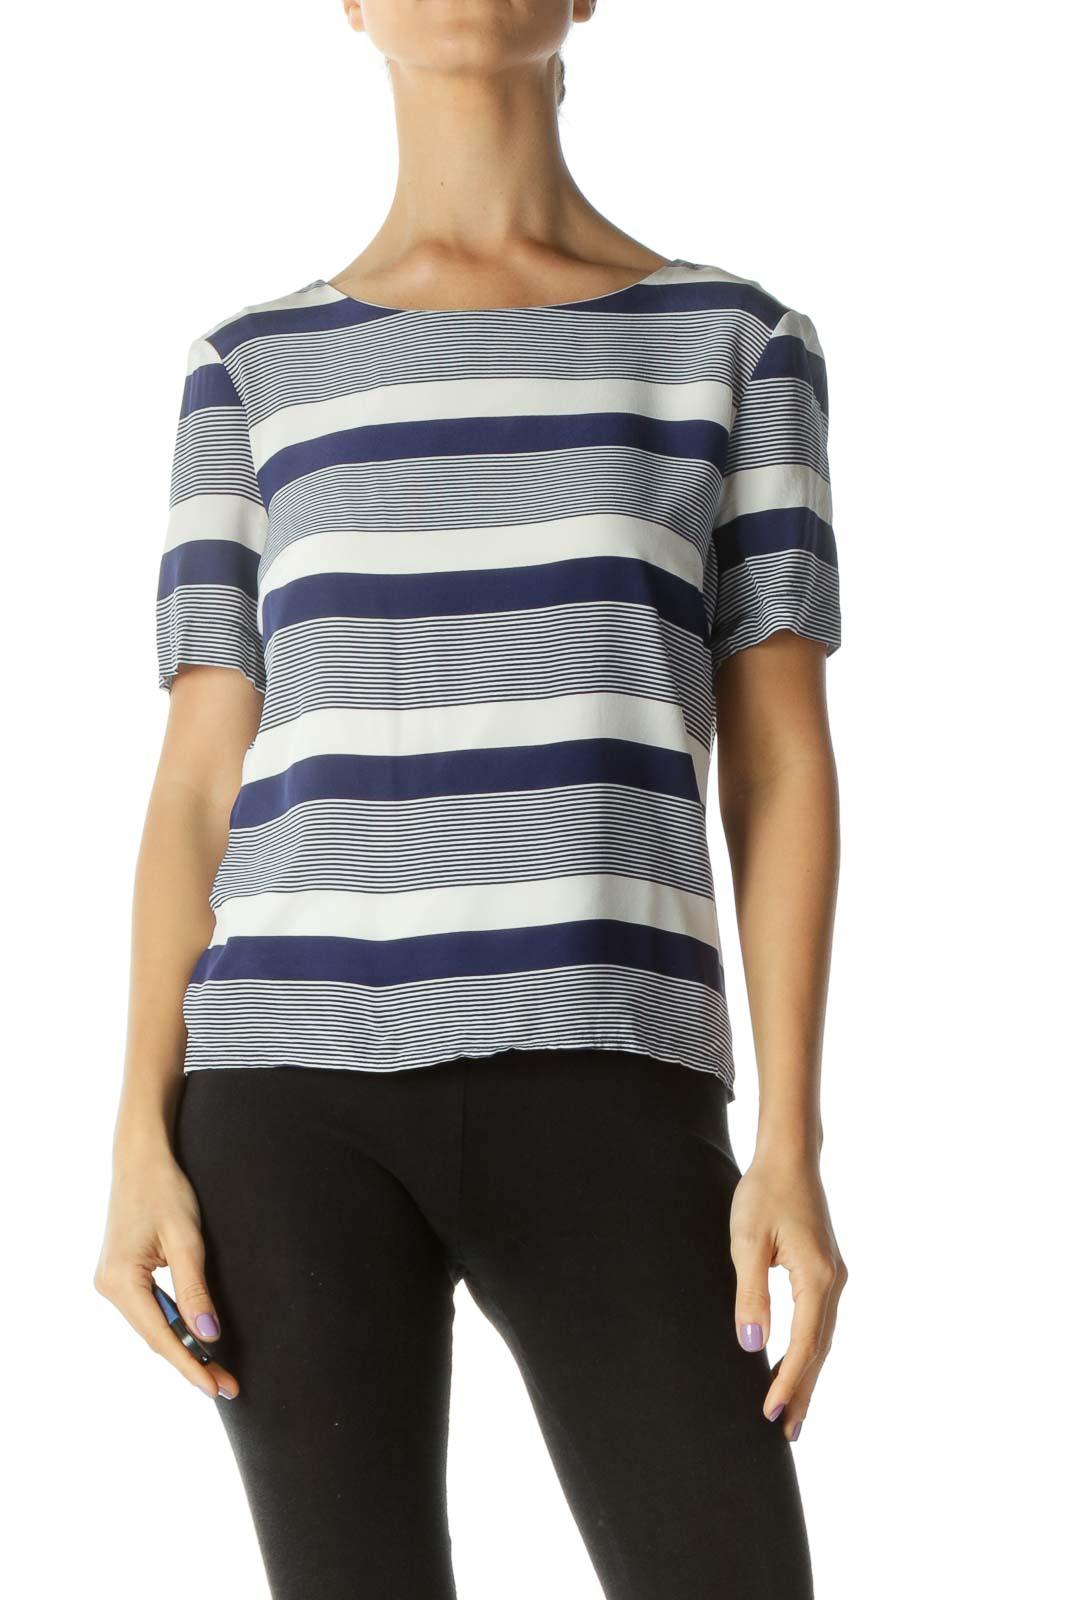 Blue Cream Silk Boat Neck Striped T-Shirt Front